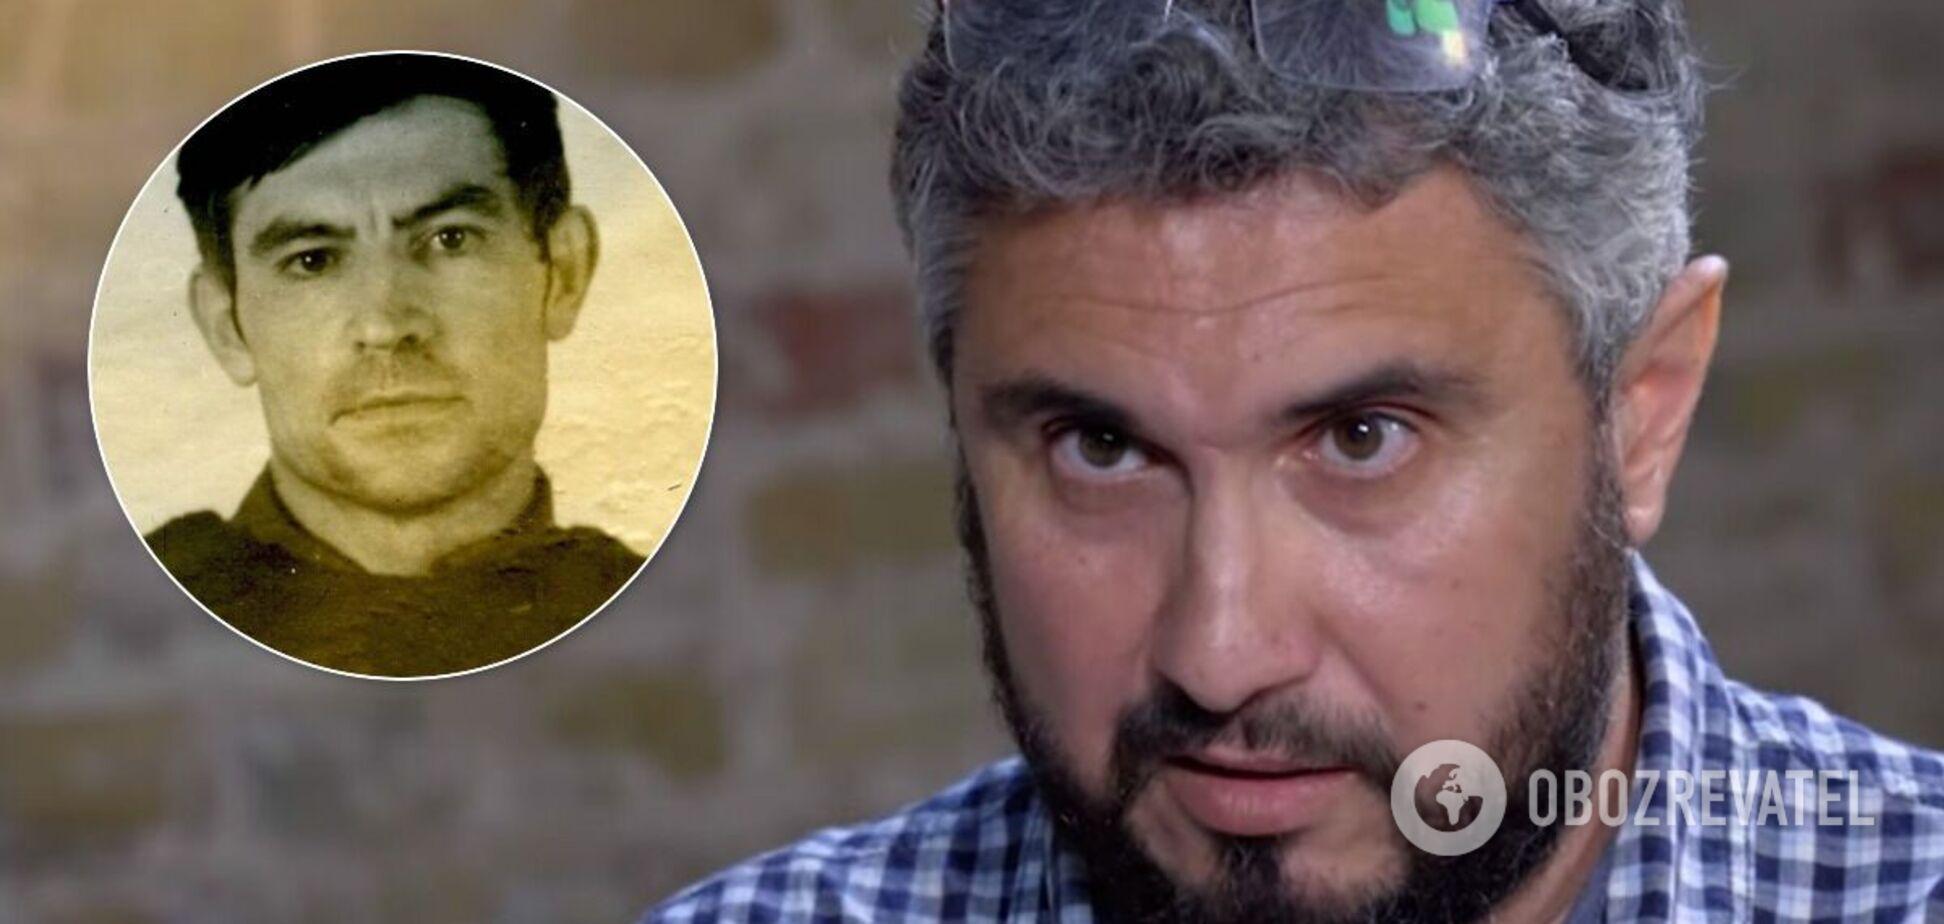 Вахтанг Кипиани обнародовал письмо Василия Стуса